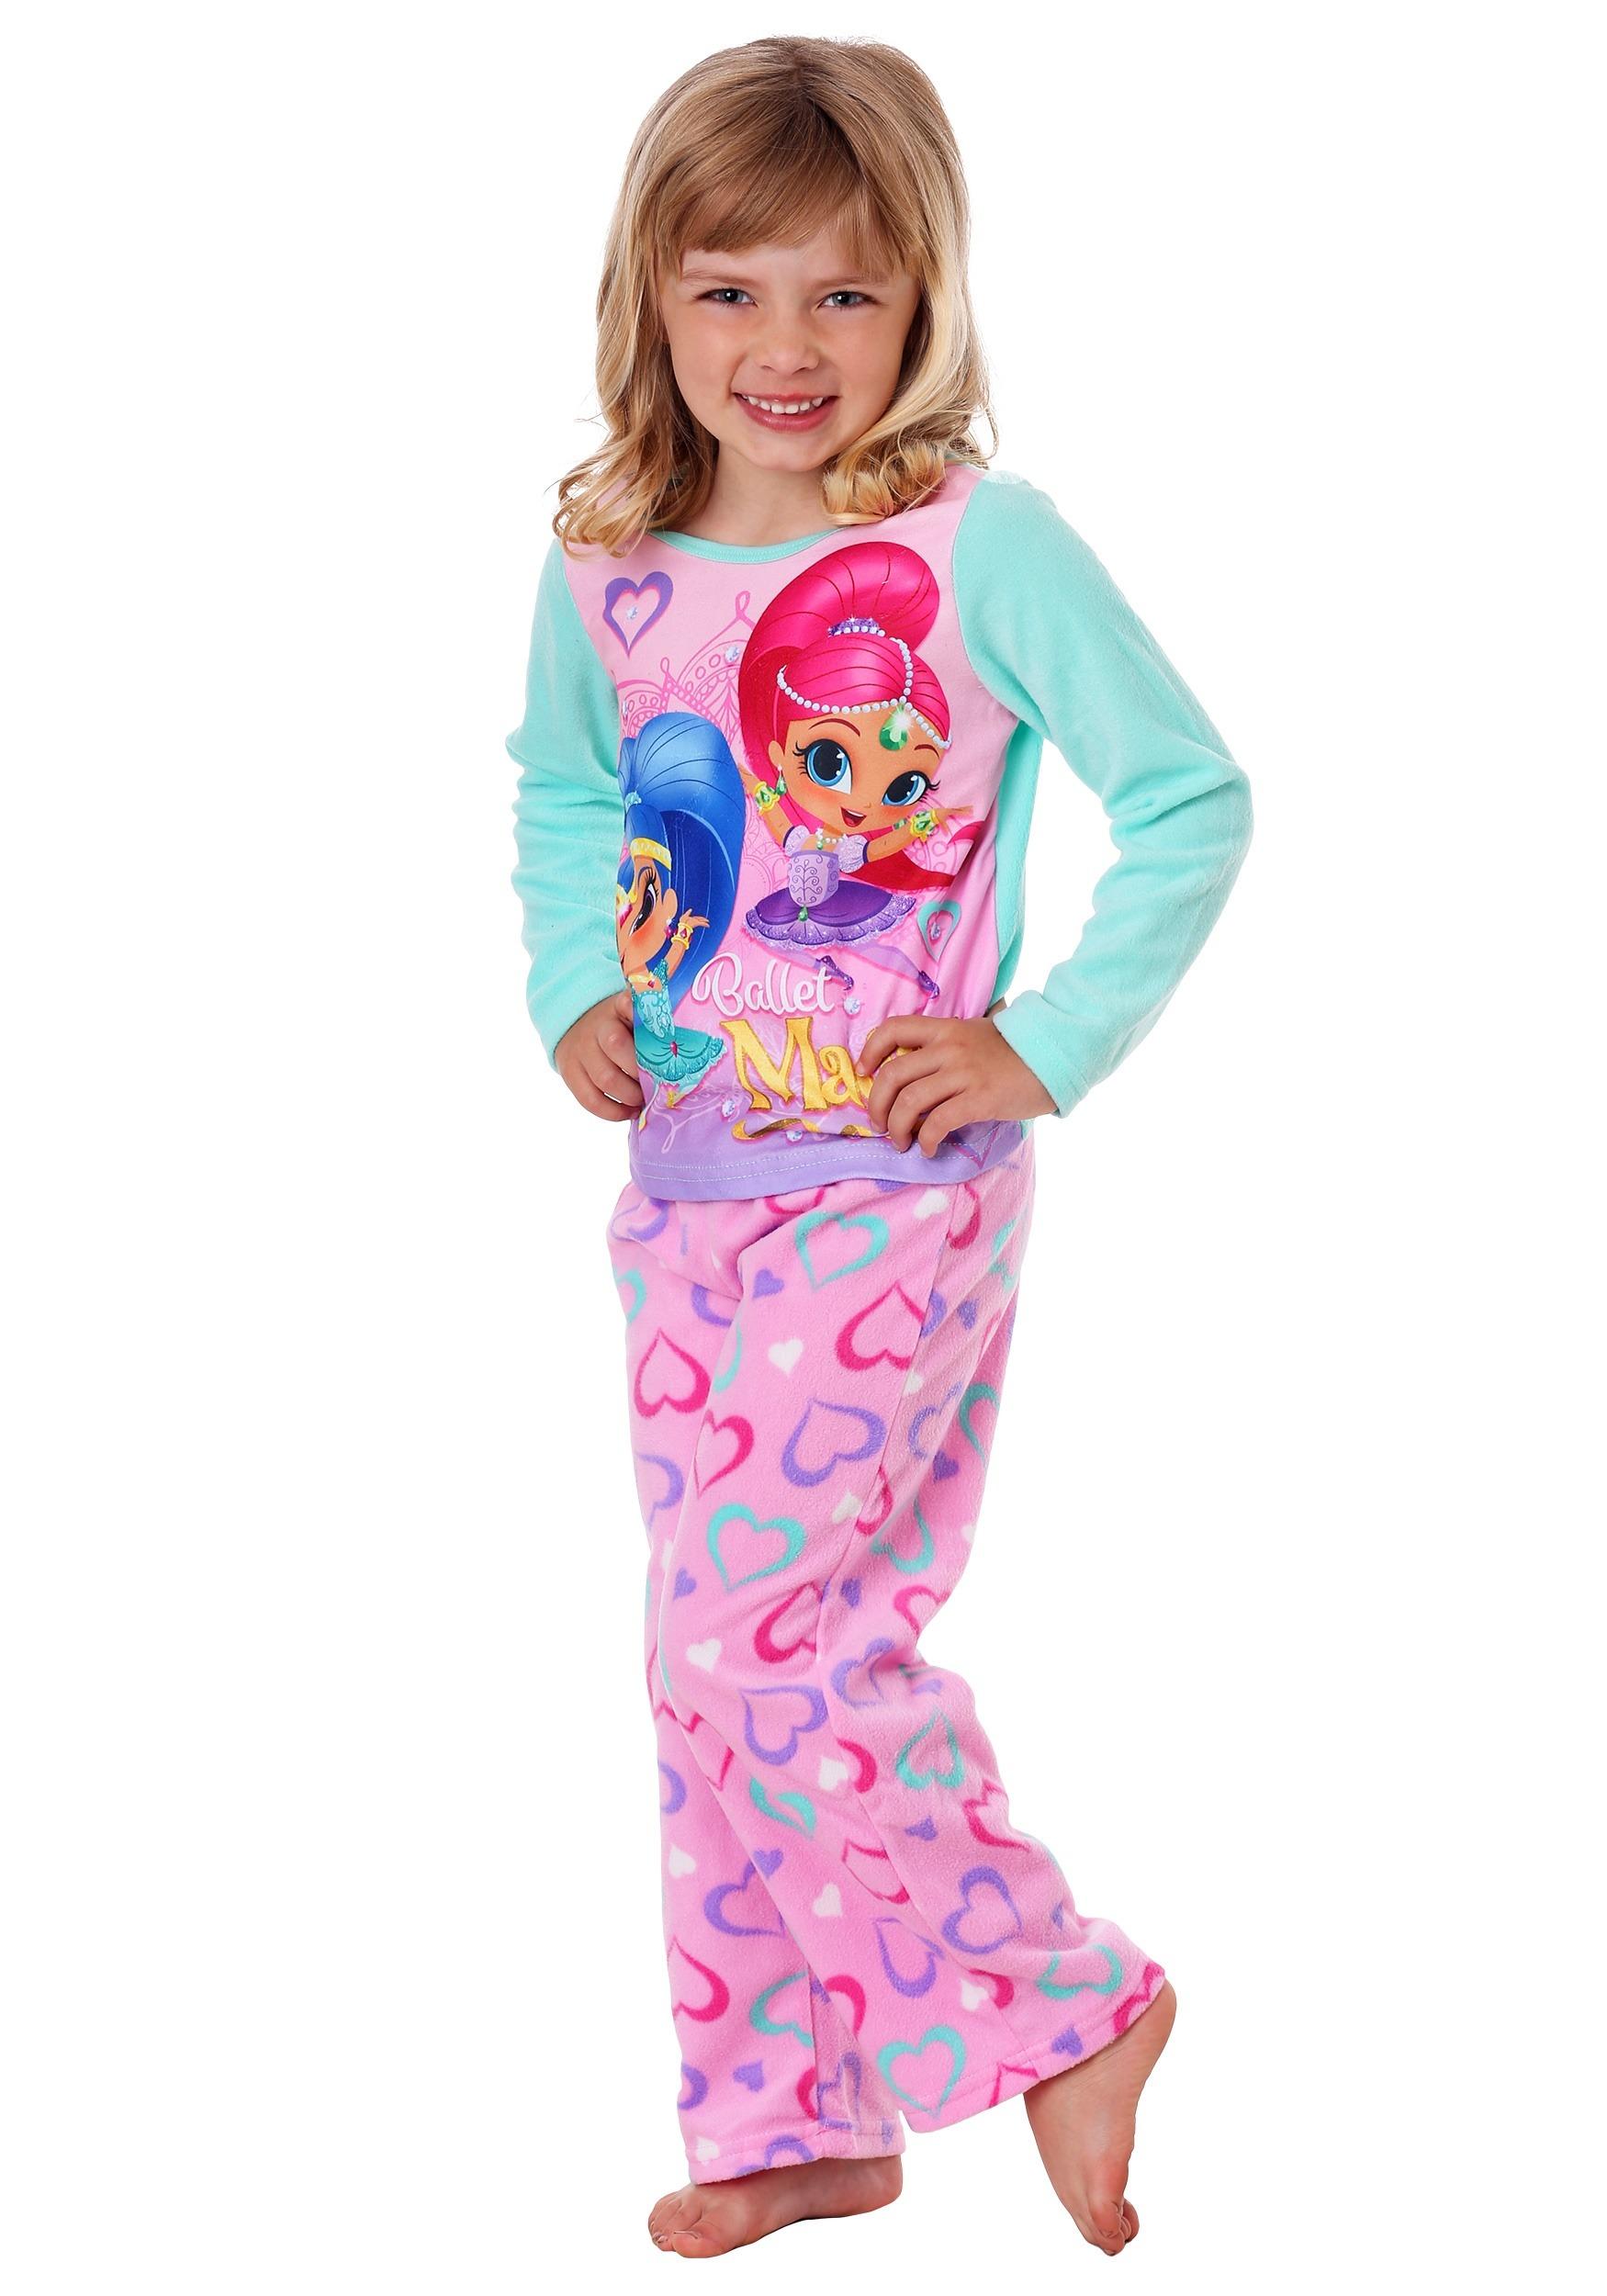 Shimmer shine girls 2 piece fleece pajama set